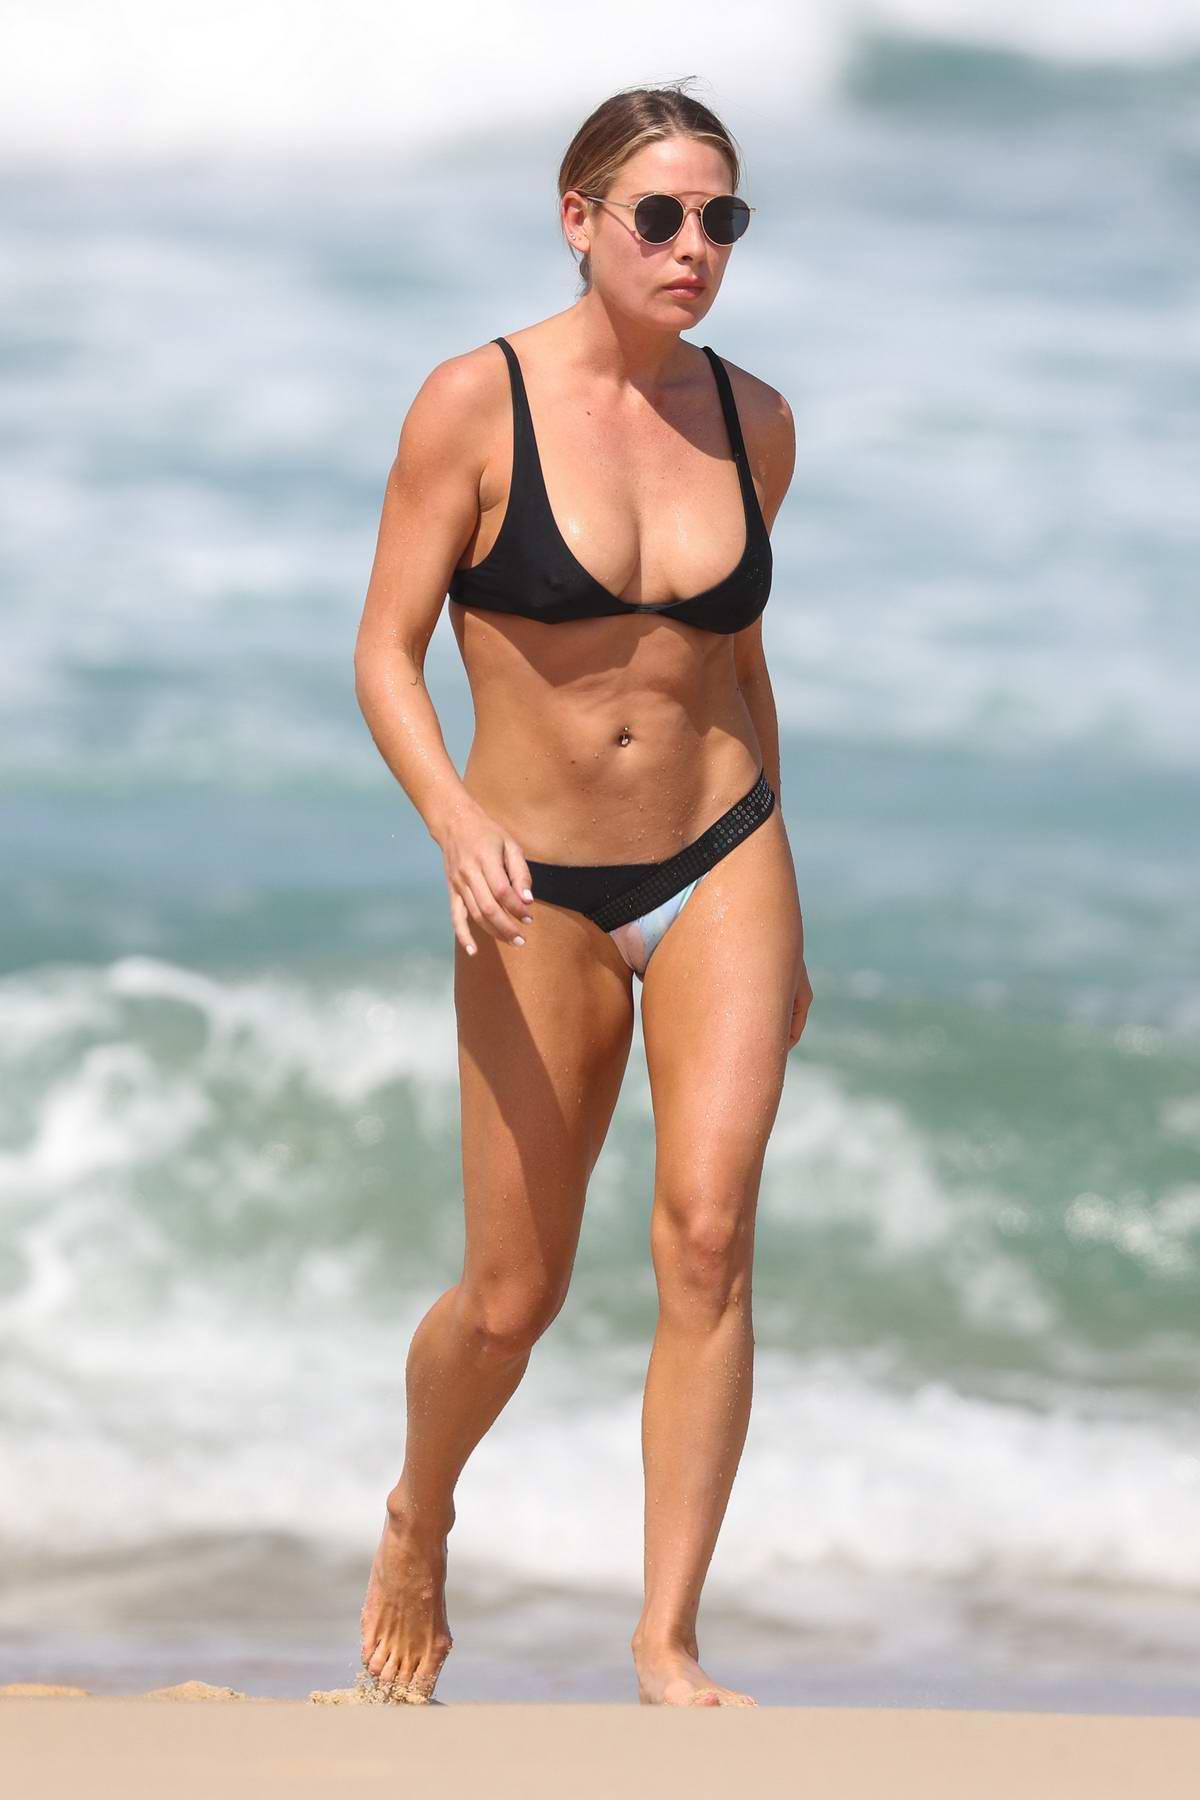 Lisa Clark in a bikini enjoying the beach in Sydney, Australia